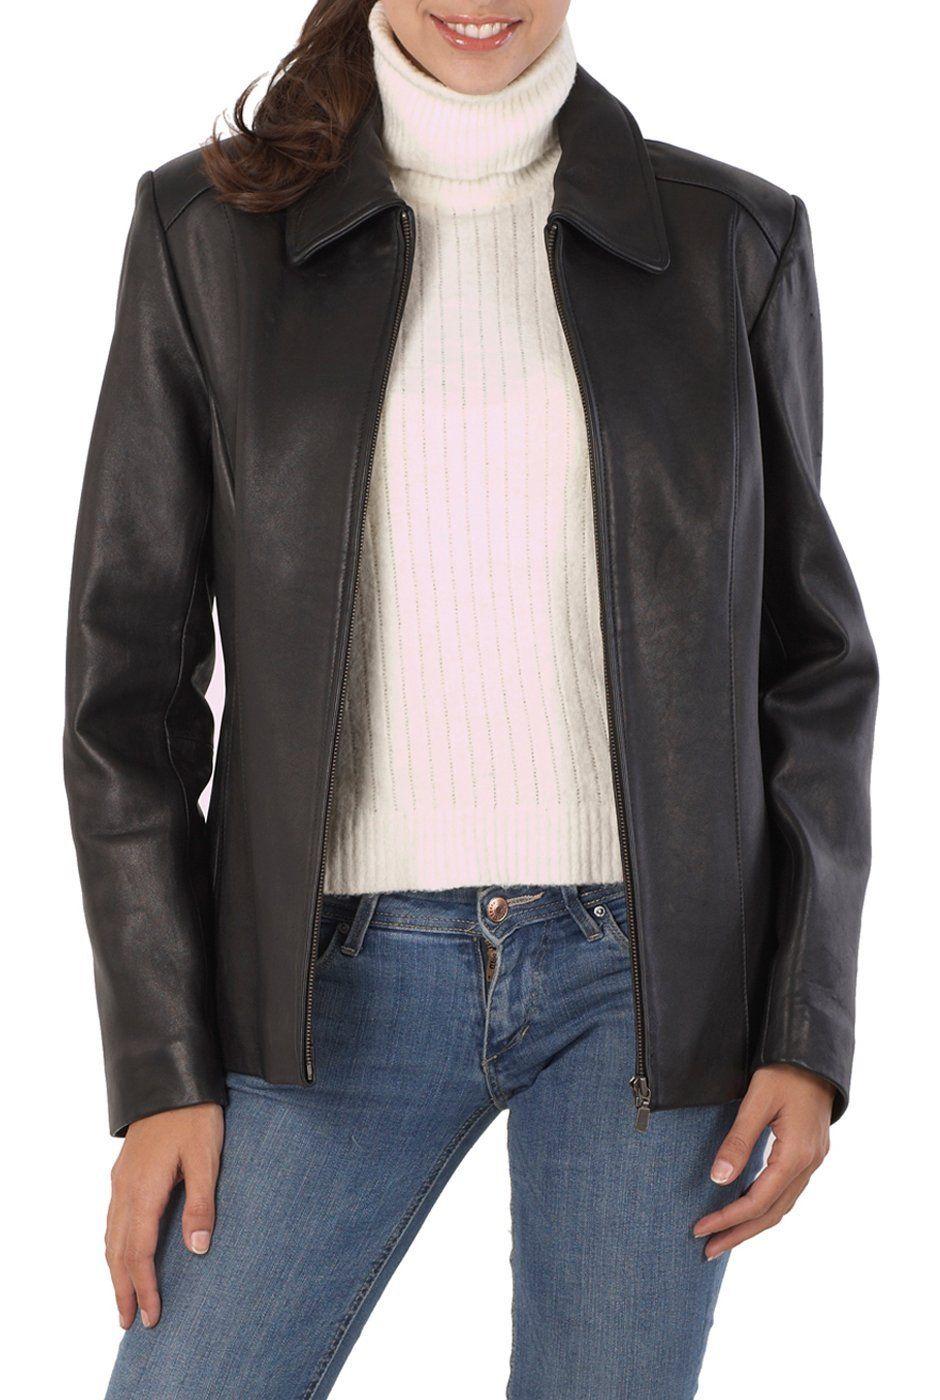 BGSD Womens Zip Front New Zealand Lambskin Leather Jacket